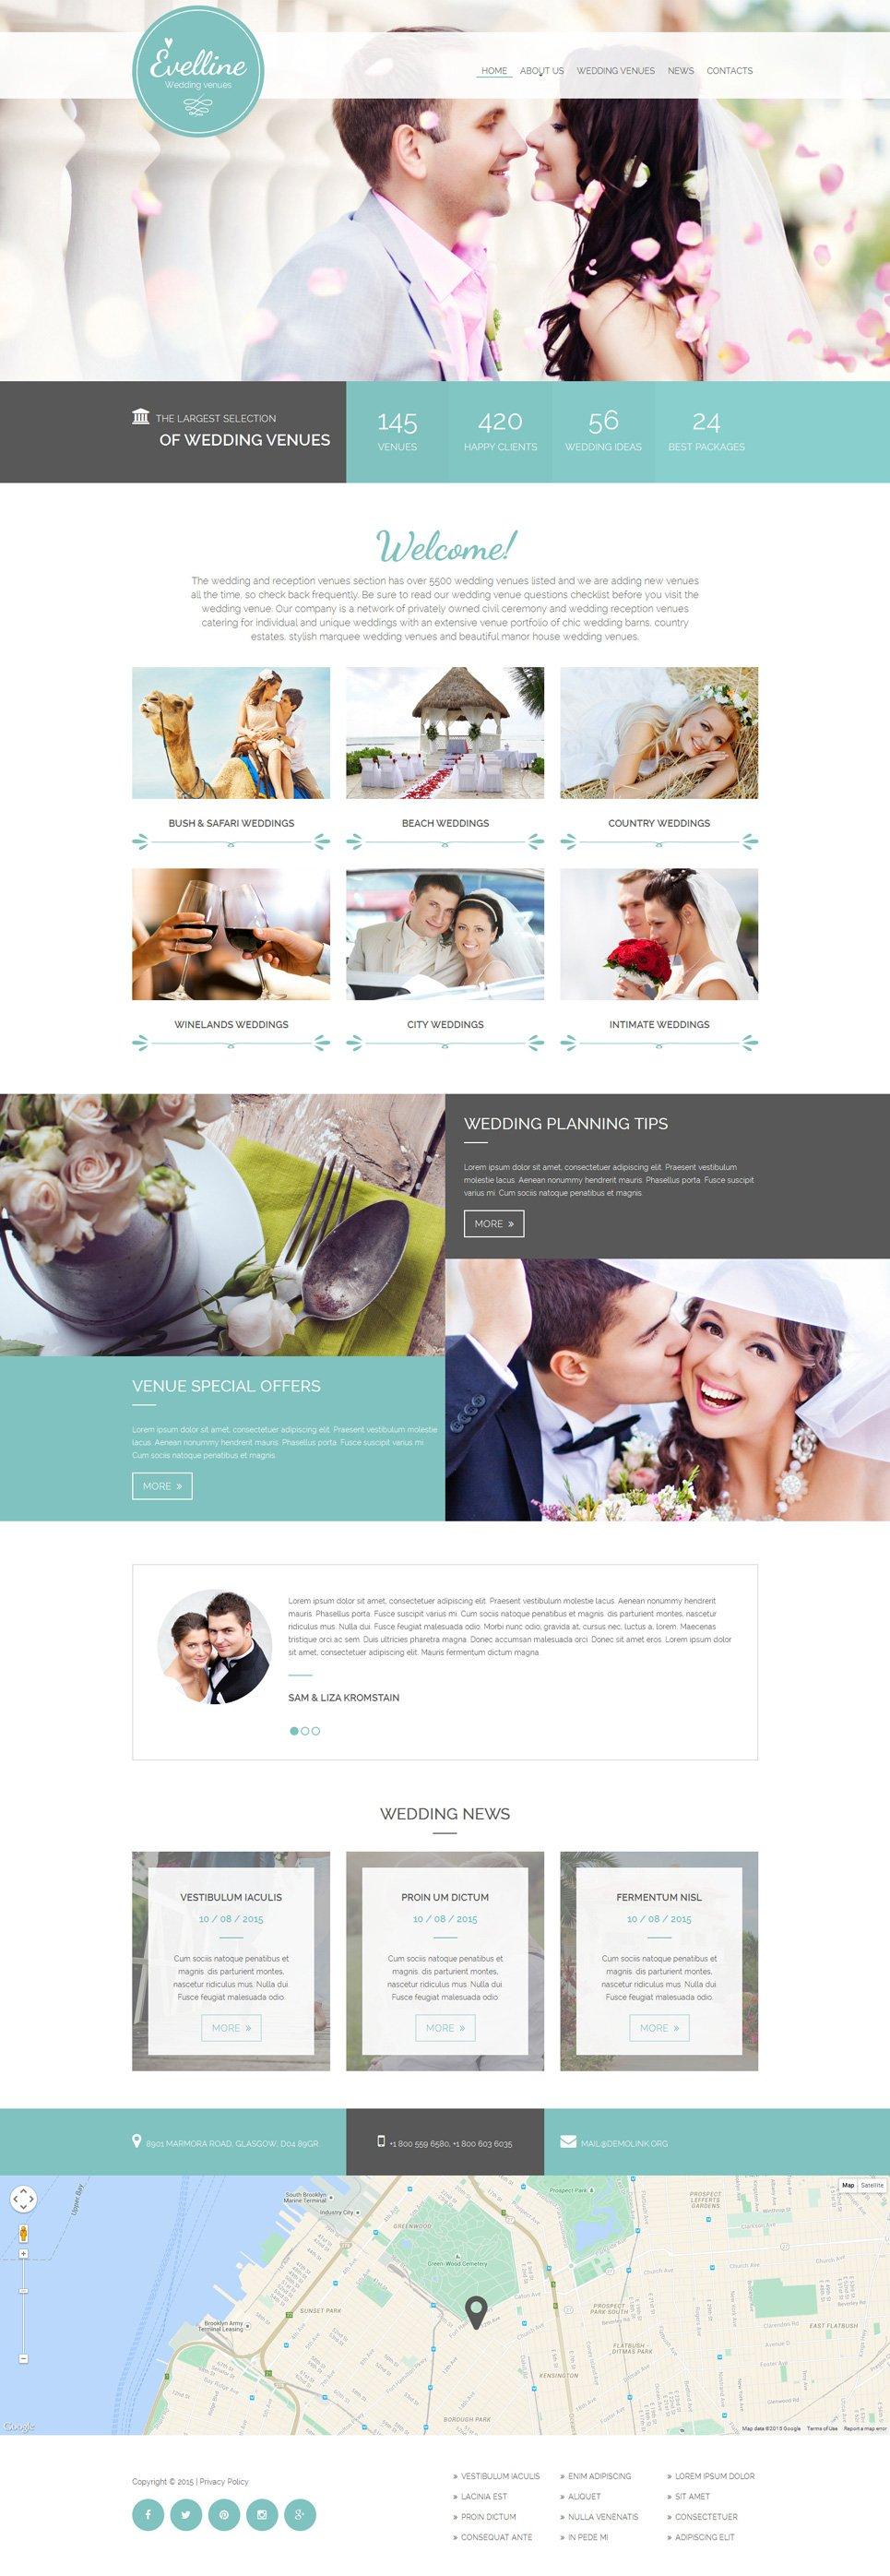 Wedding Venues Website Template